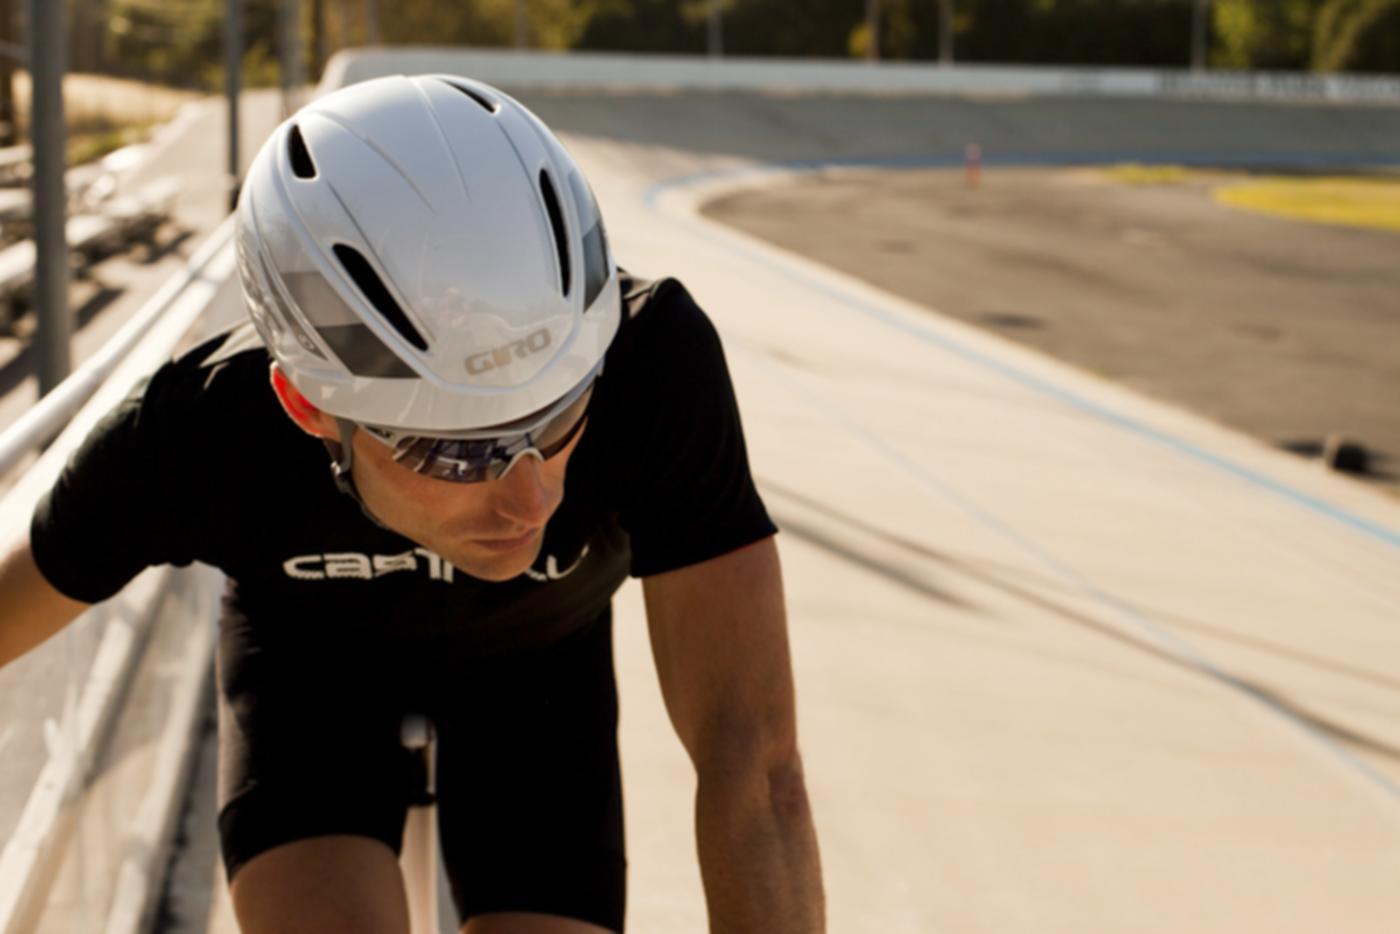 Giro Introduces the Air Attack Helmet